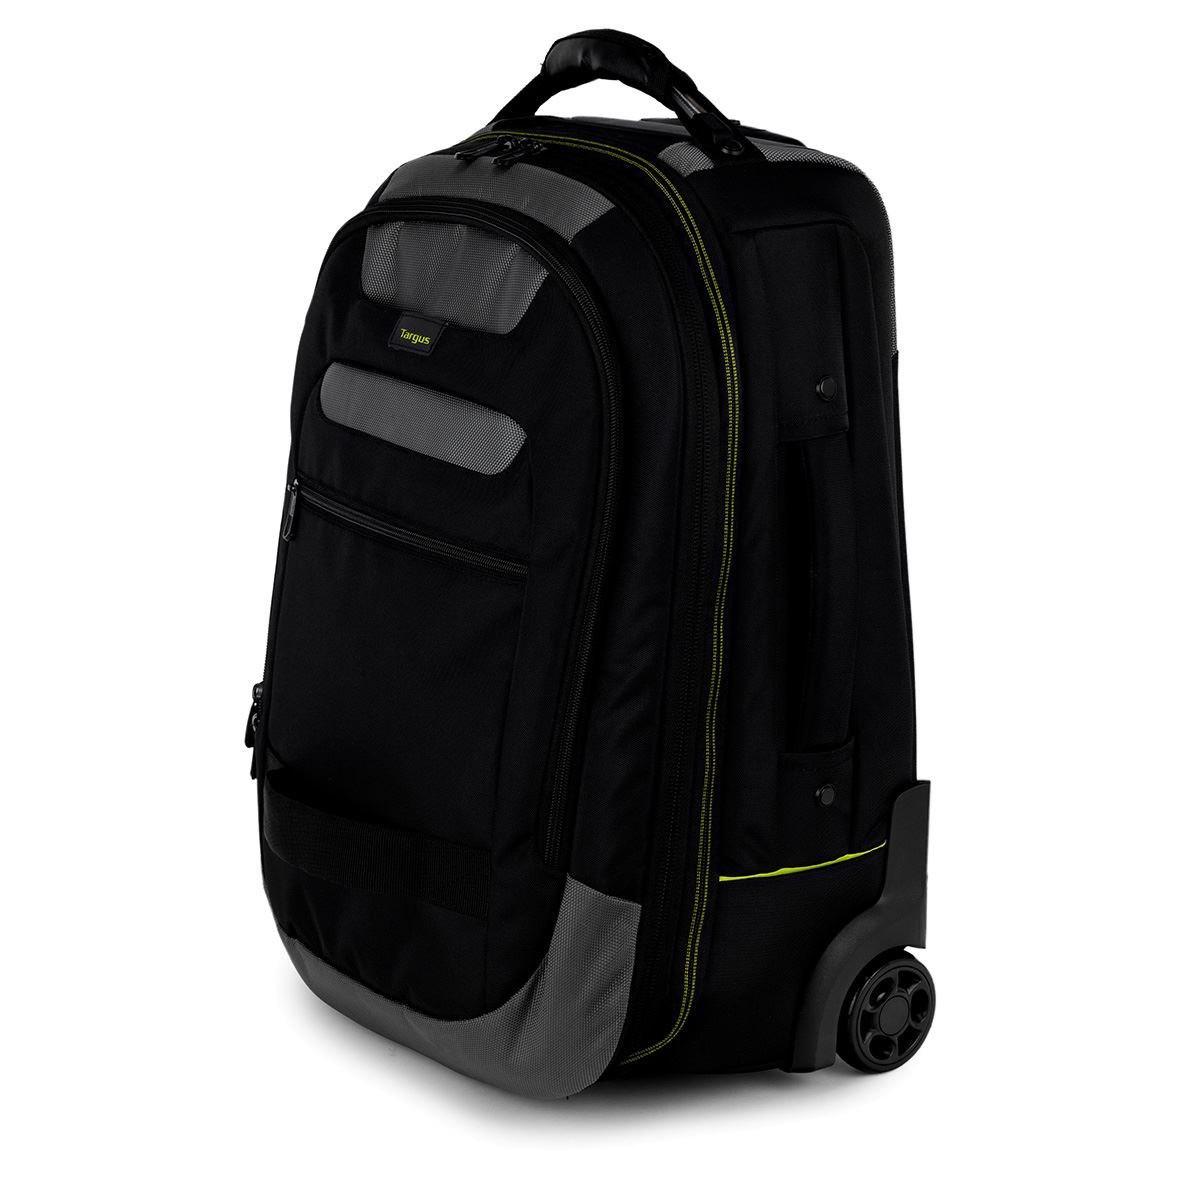 "Targus City Gear TCG715AU Carrying Case (Roller) for 39.6 cm (15.6"") Notebook - Black"